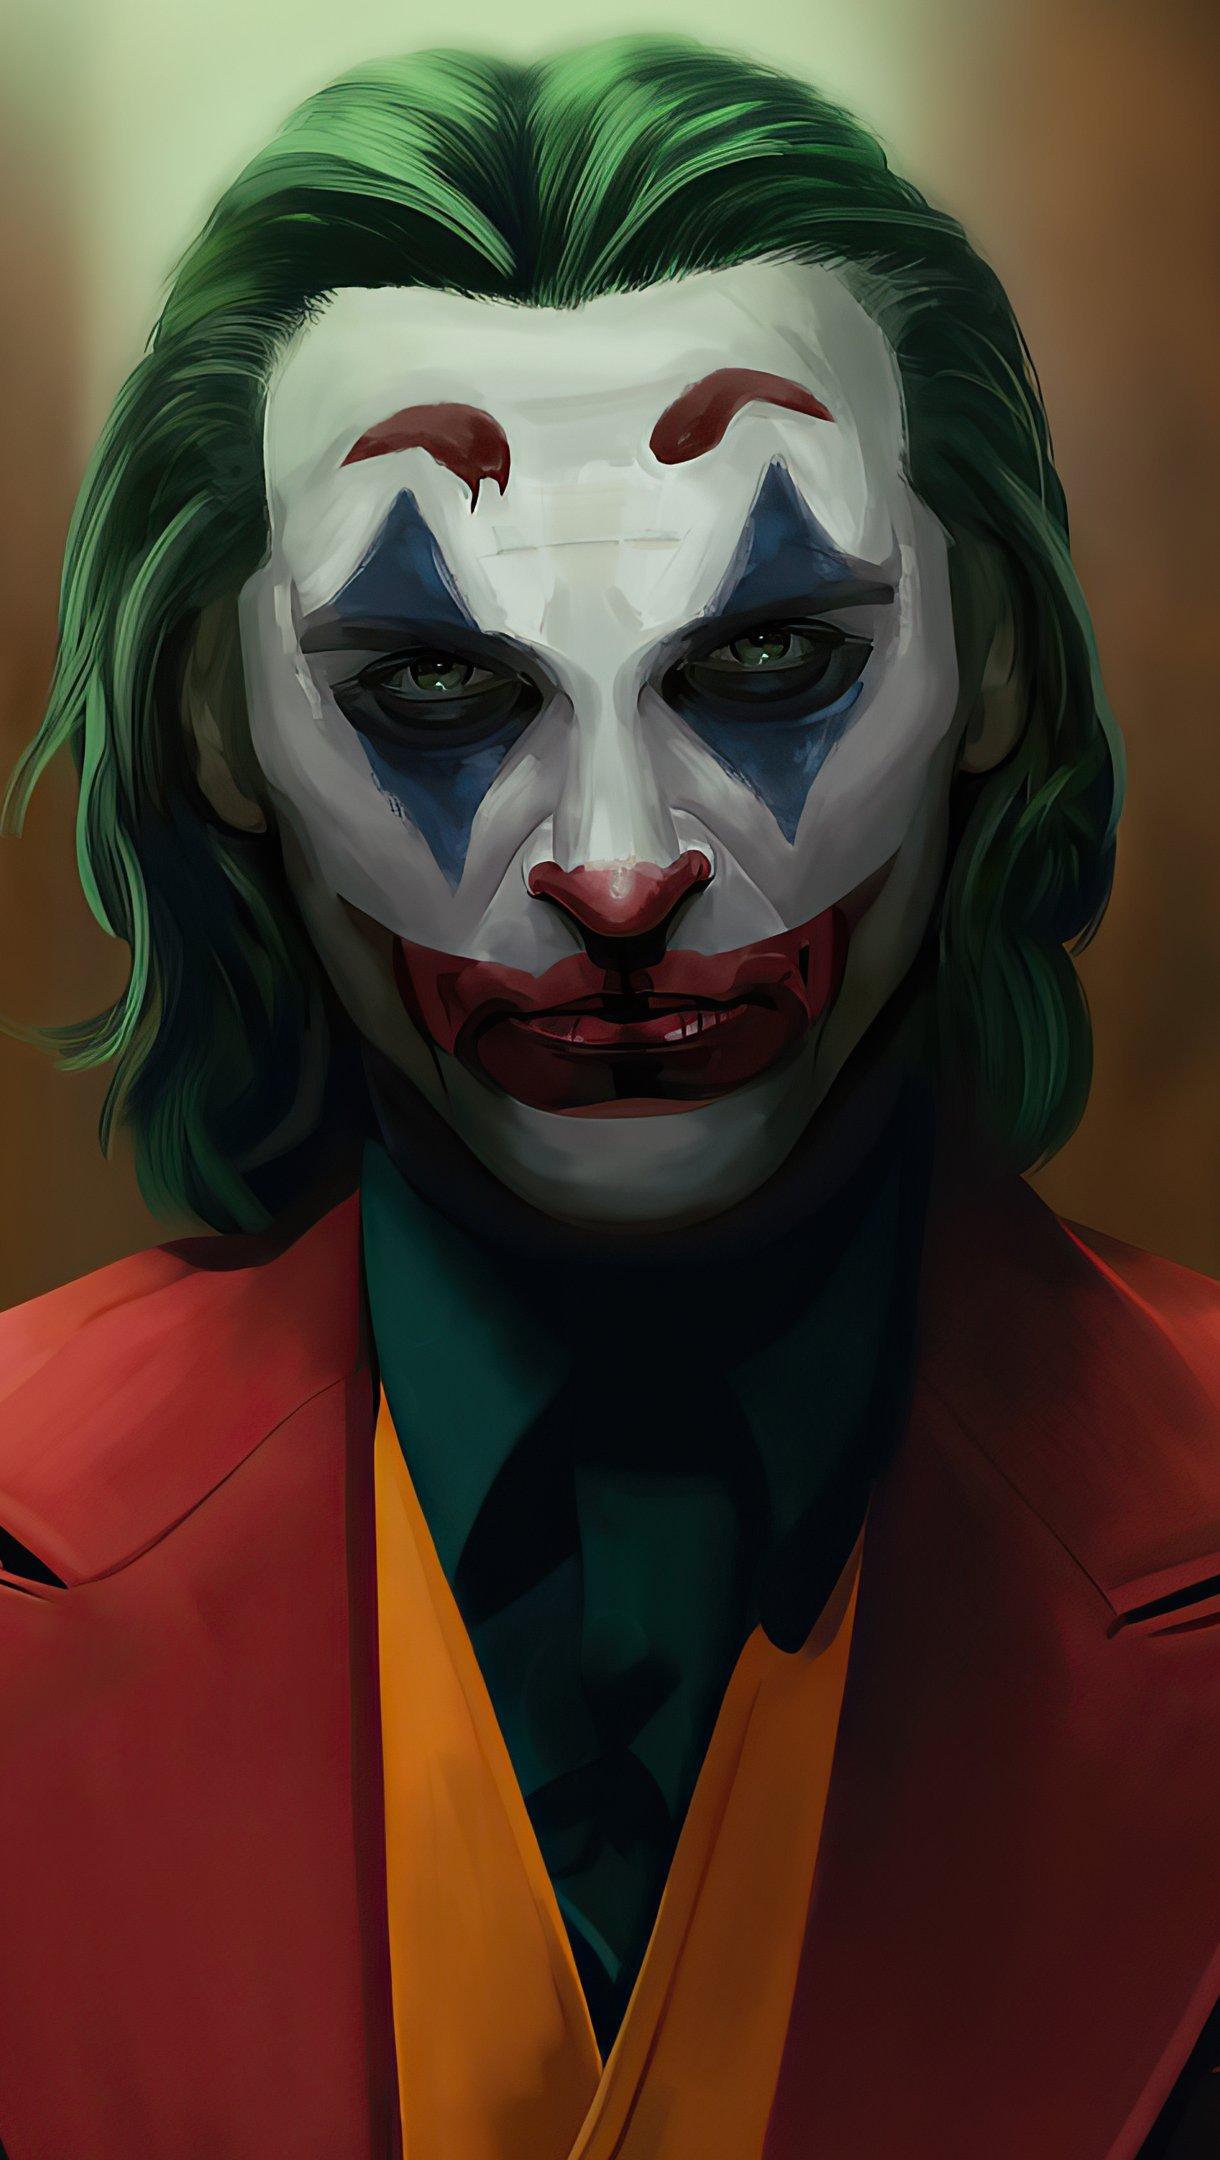 Wallpaper Joker Sketch Artwork Vertical